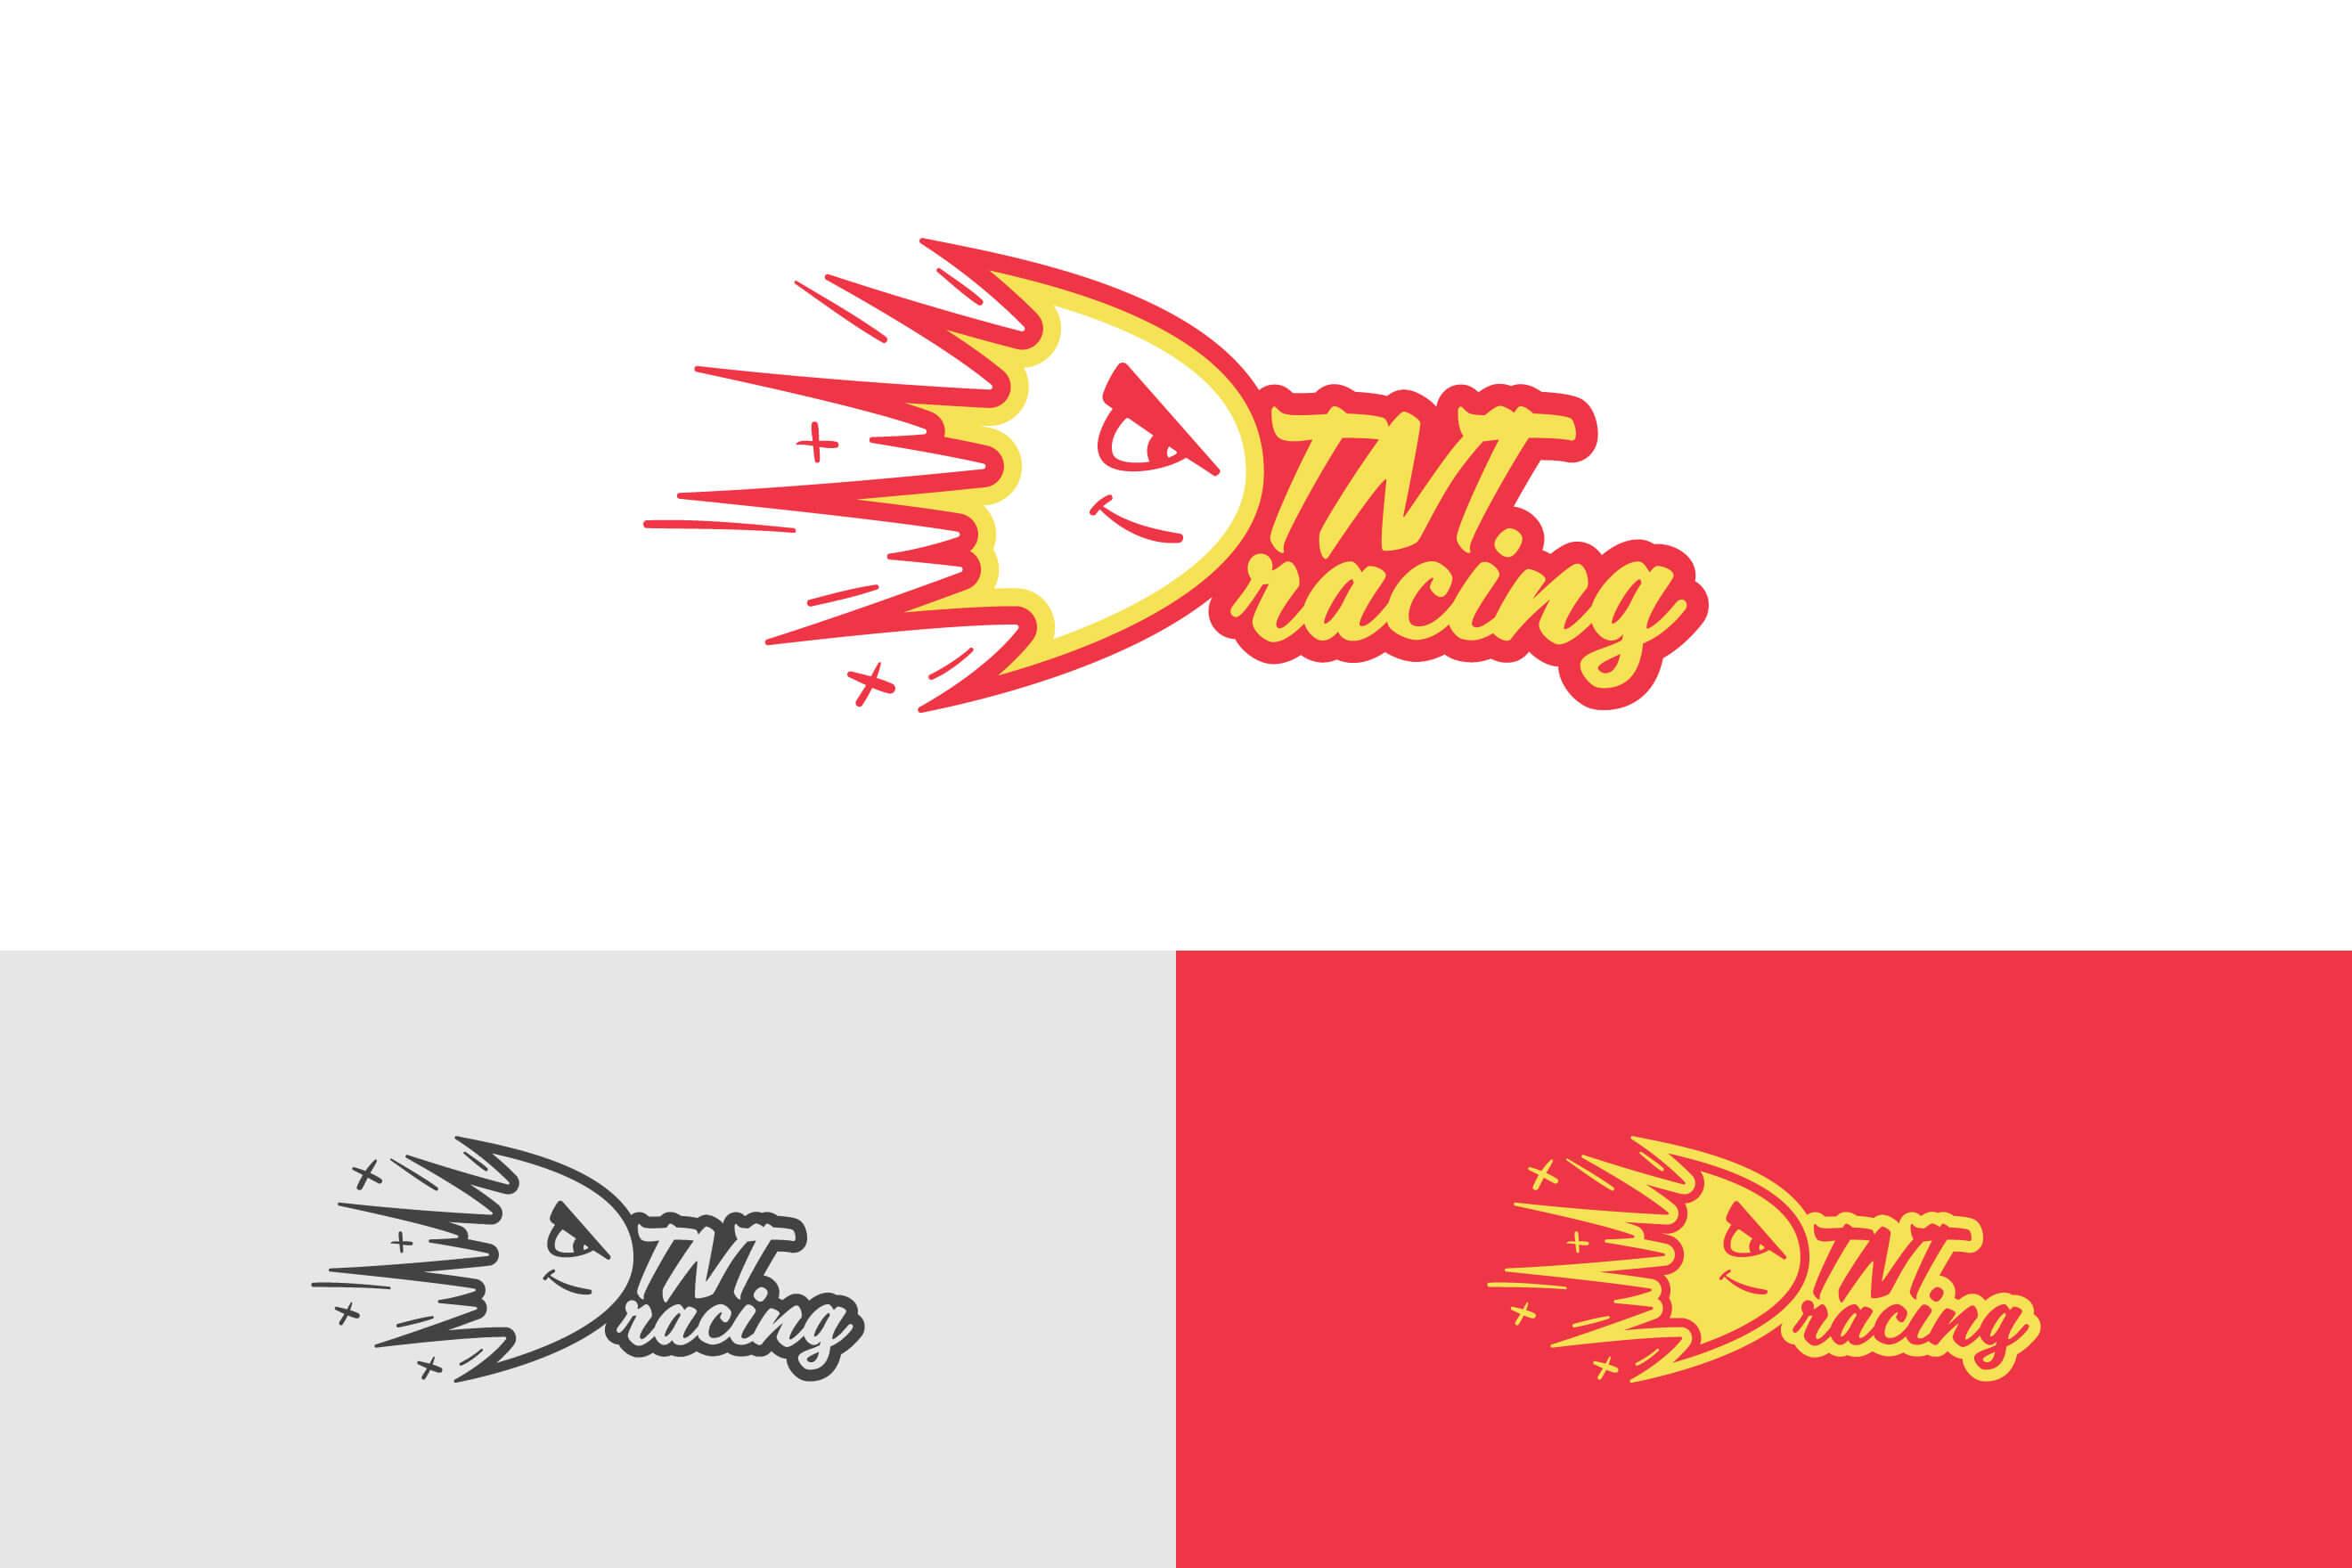 logo design for TNT Racing